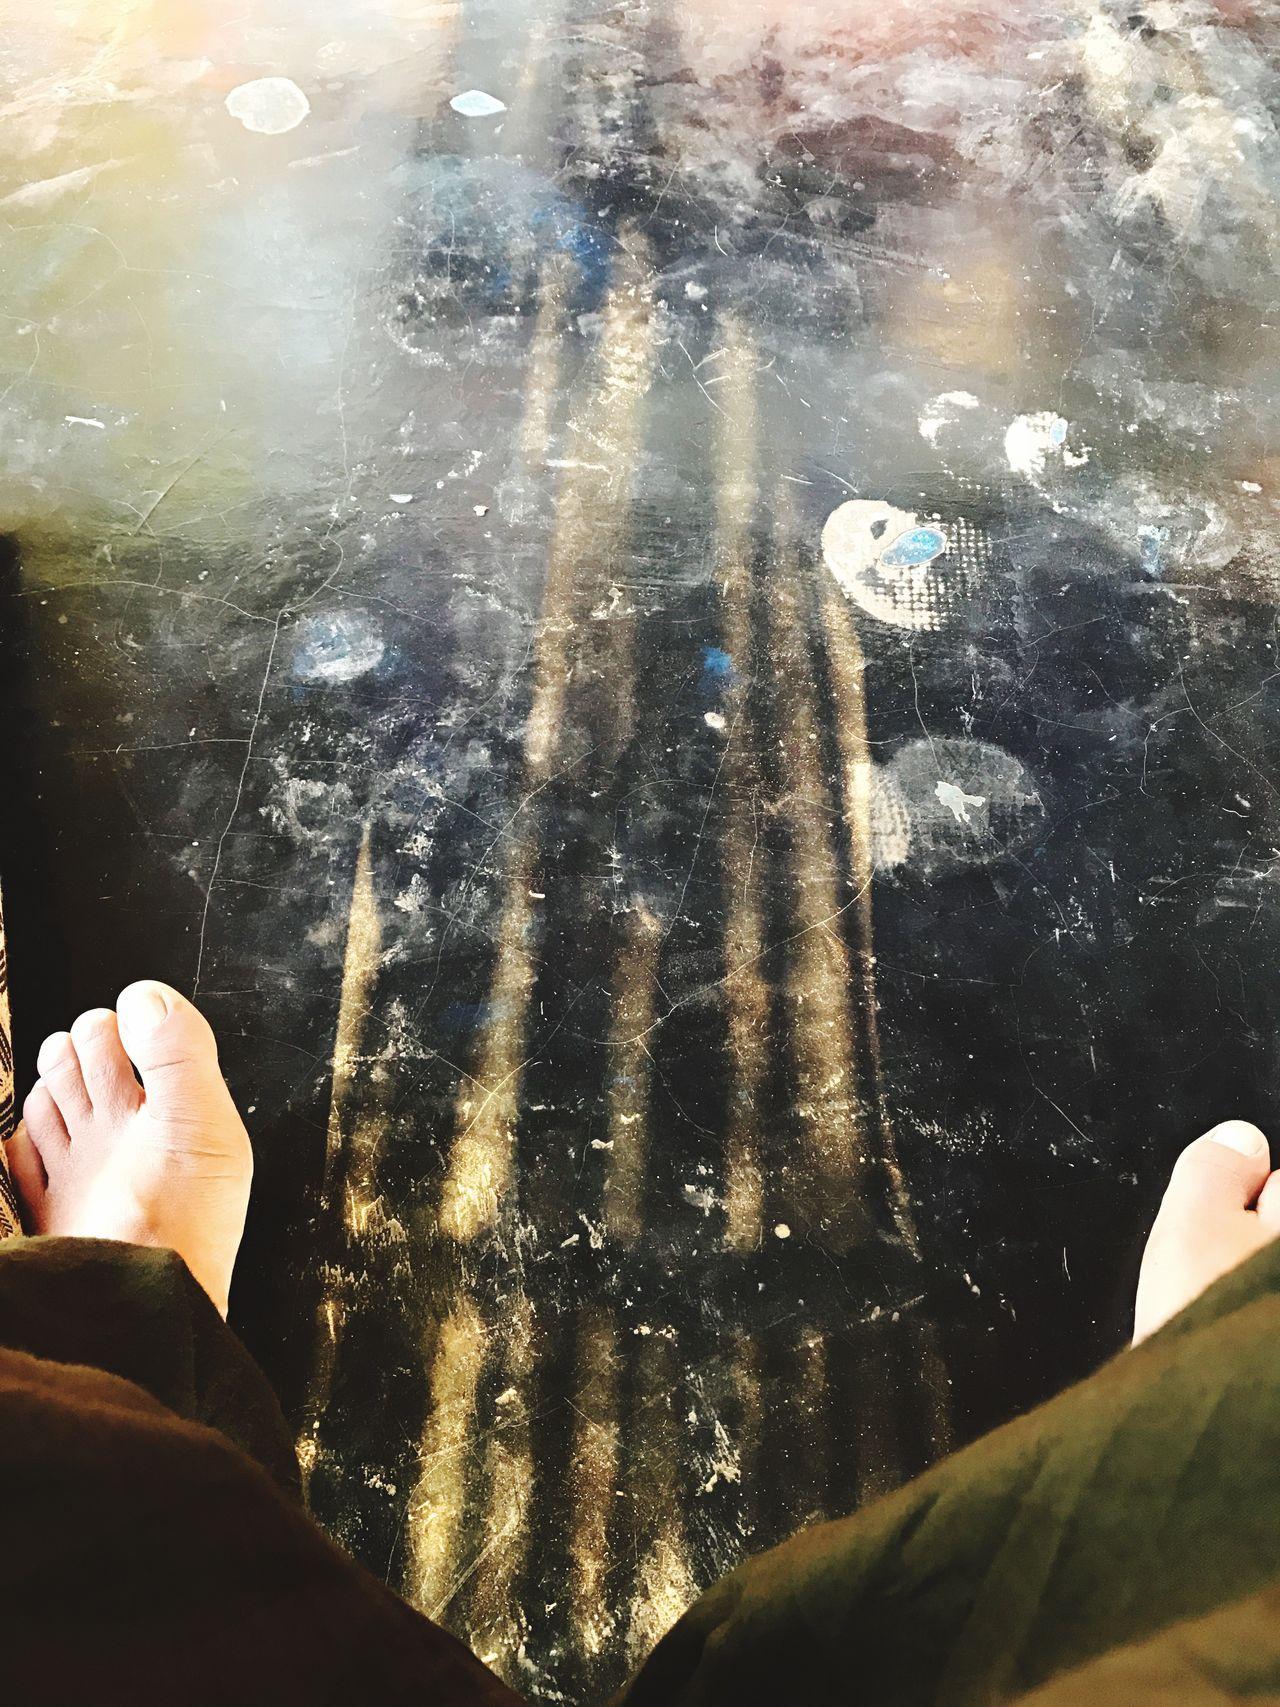 Barefoot Relaxing Lifestyles LoveArtEatArt_IsMe Easy Life